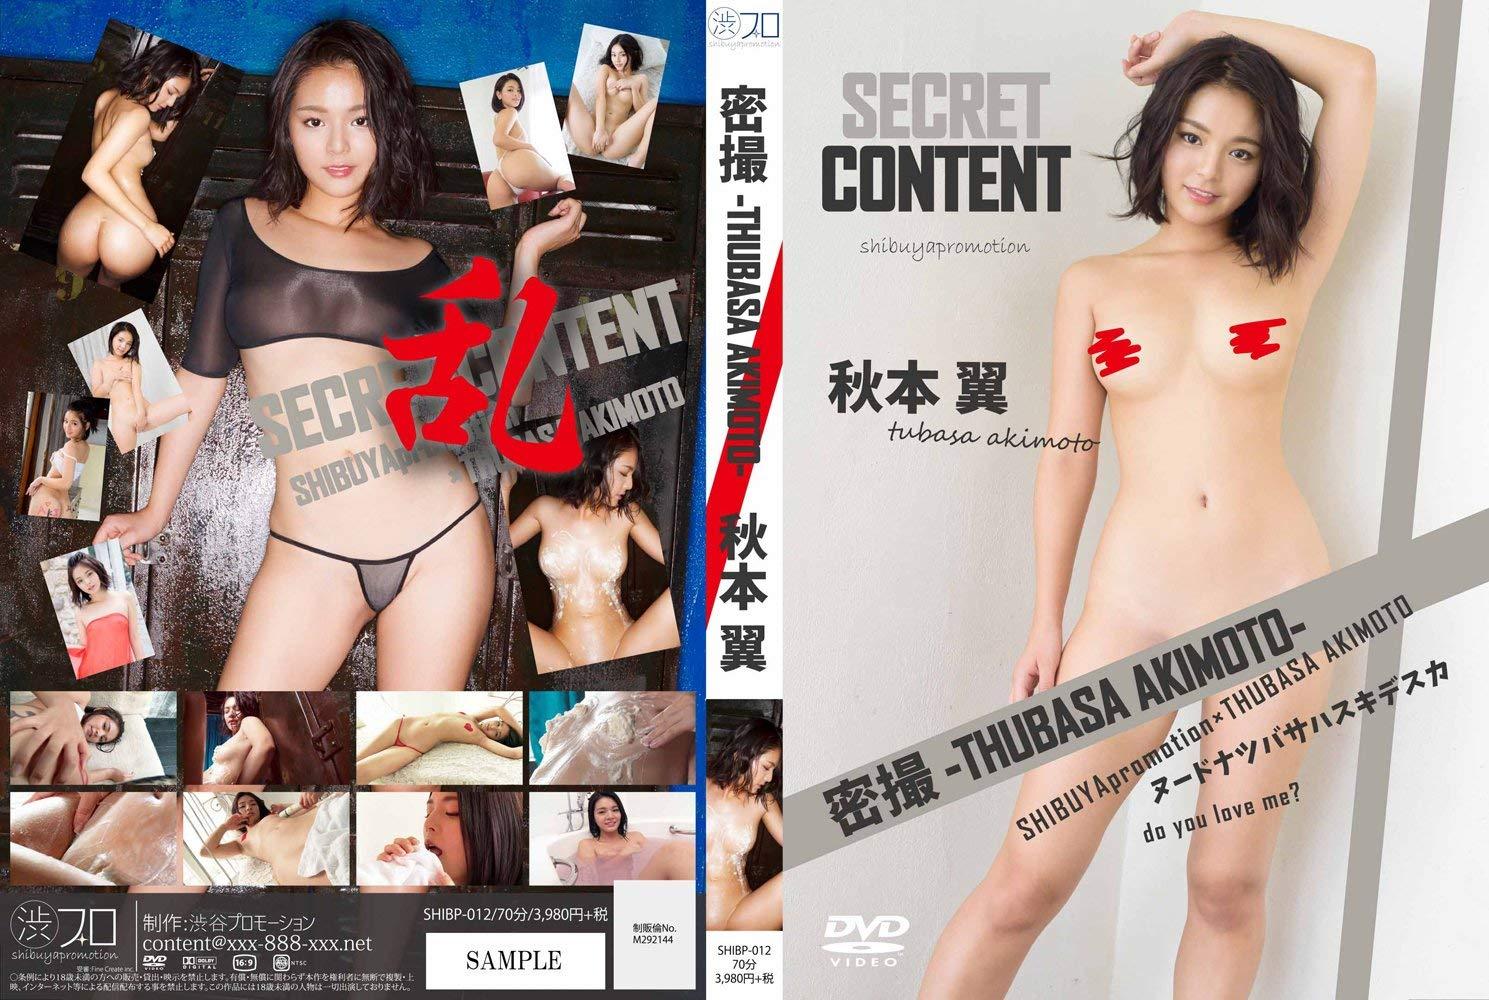 [SHIBP-012] Tsubasa Akimoto 秋本翼 – Secret Content Close Photo Session 密撮